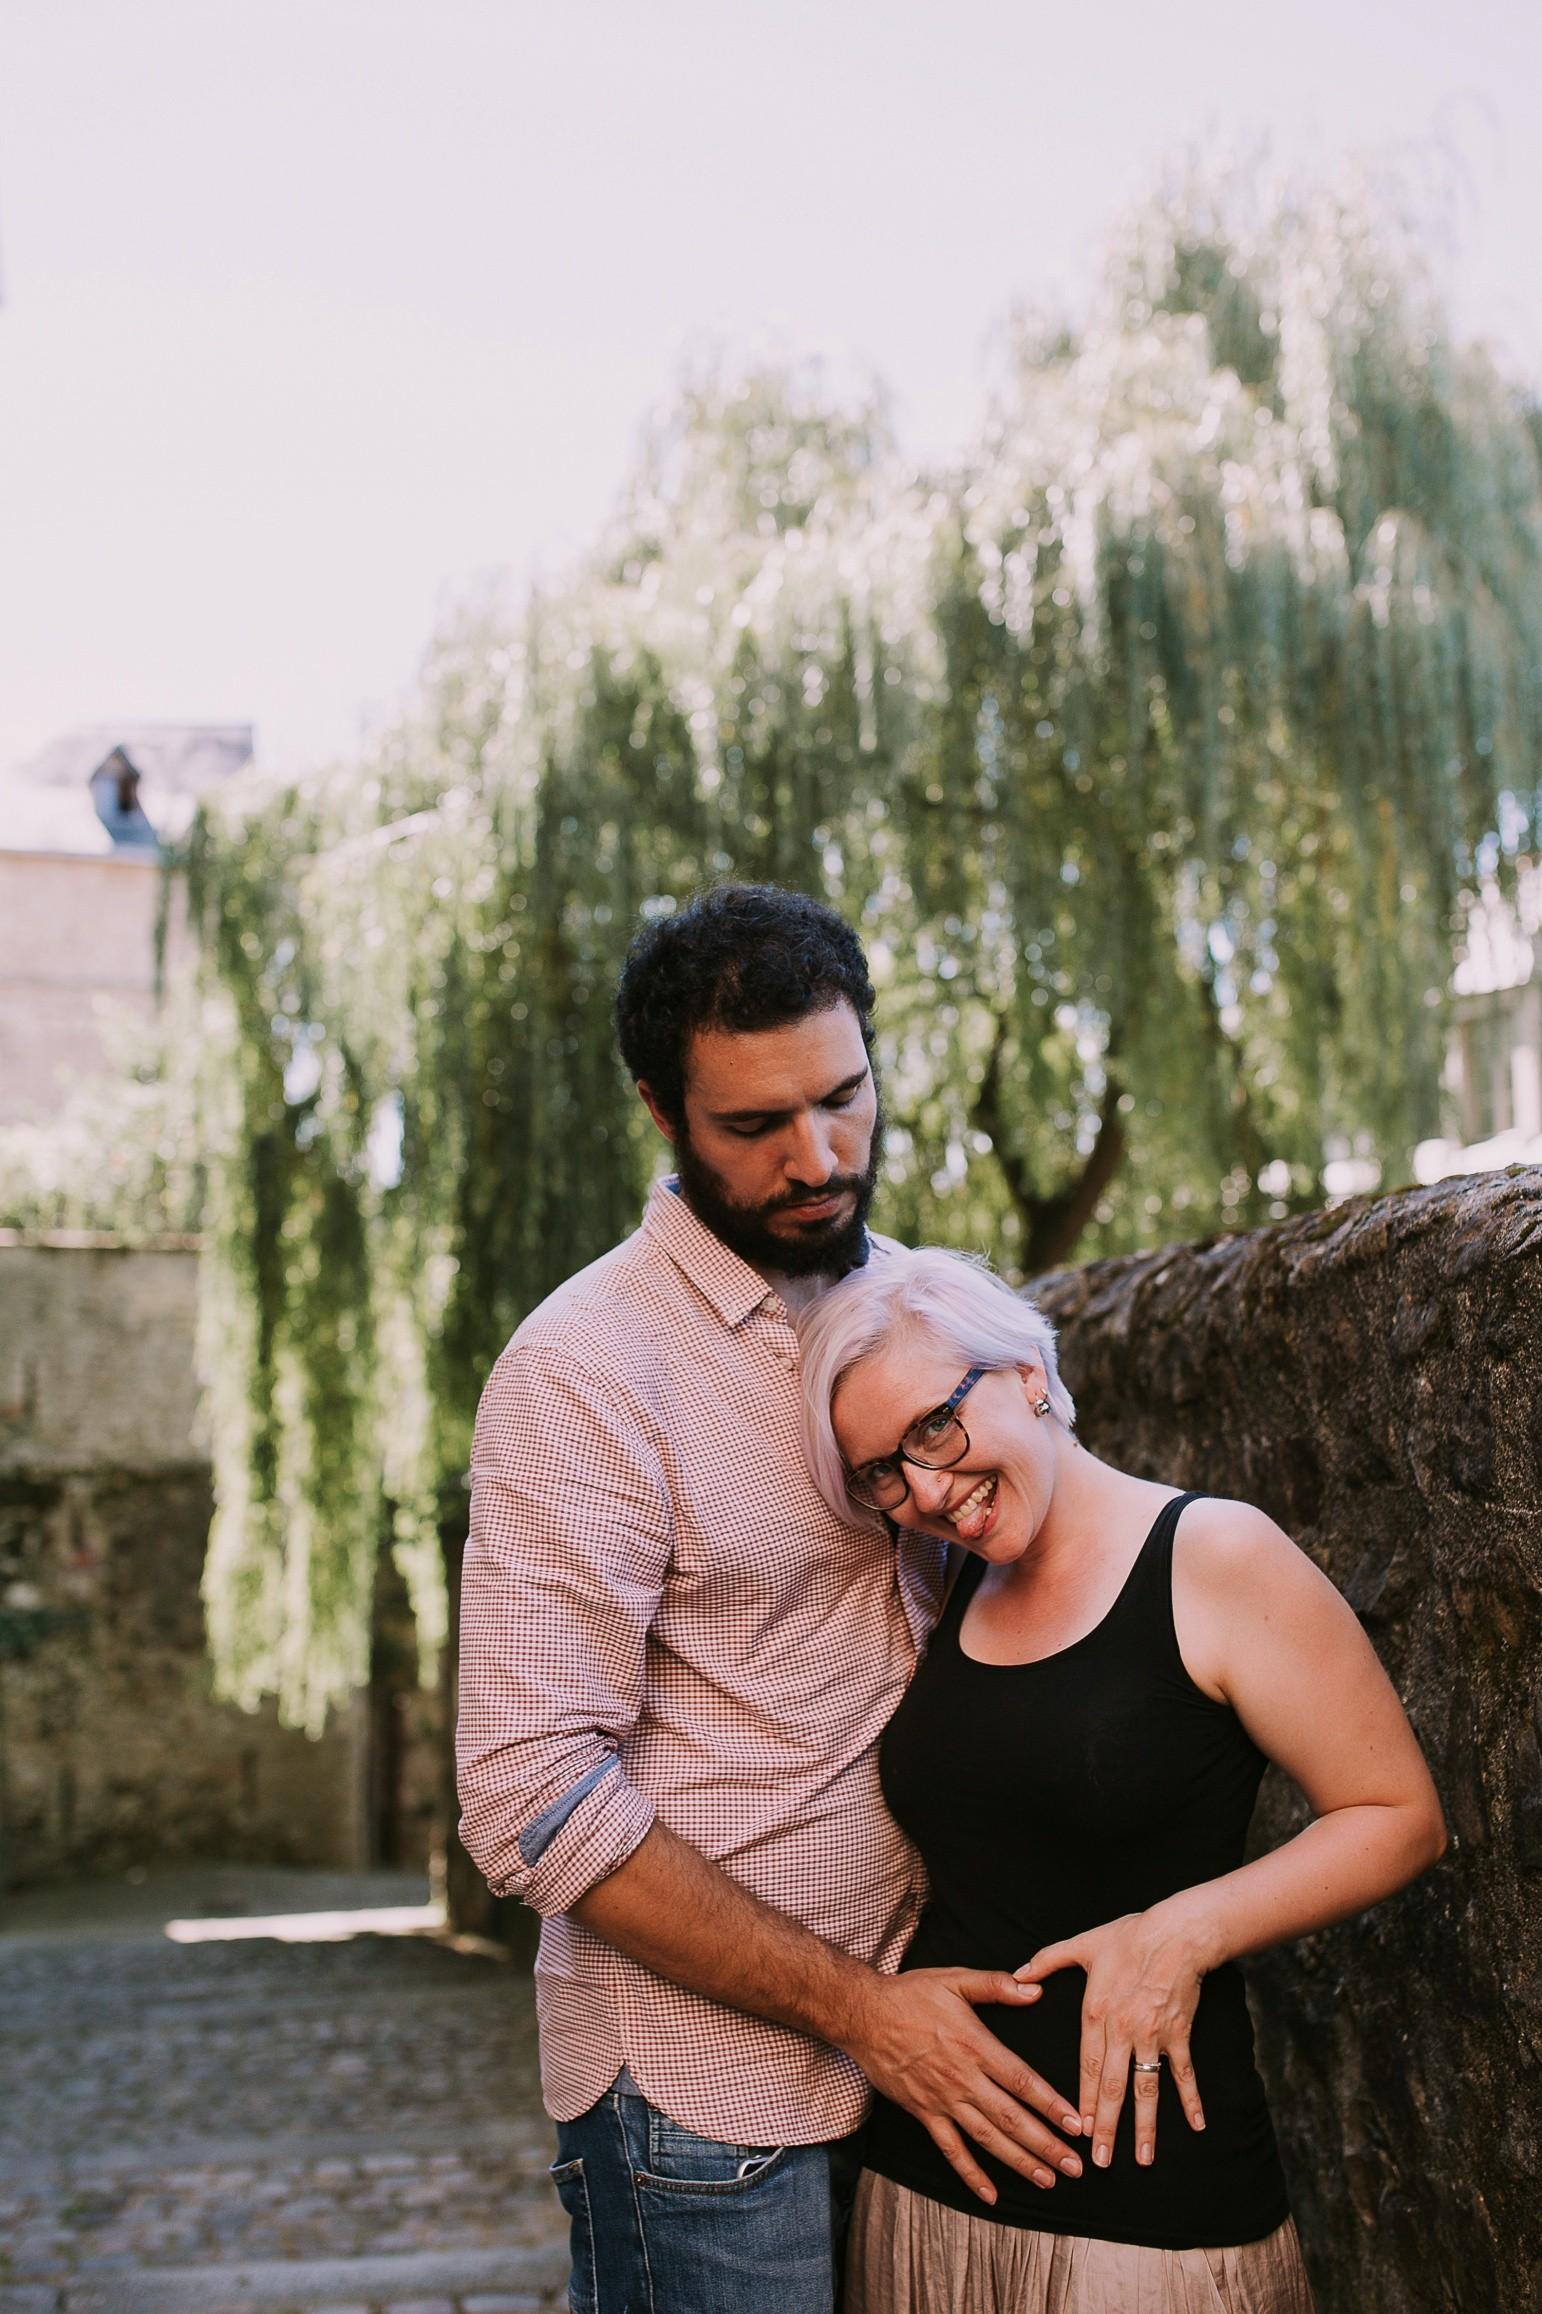 kateryna-photos-mariage-photographe-pornic-bretagne-nantes-couple-engagement-love-story-le-mans-wedding_0210.jpg